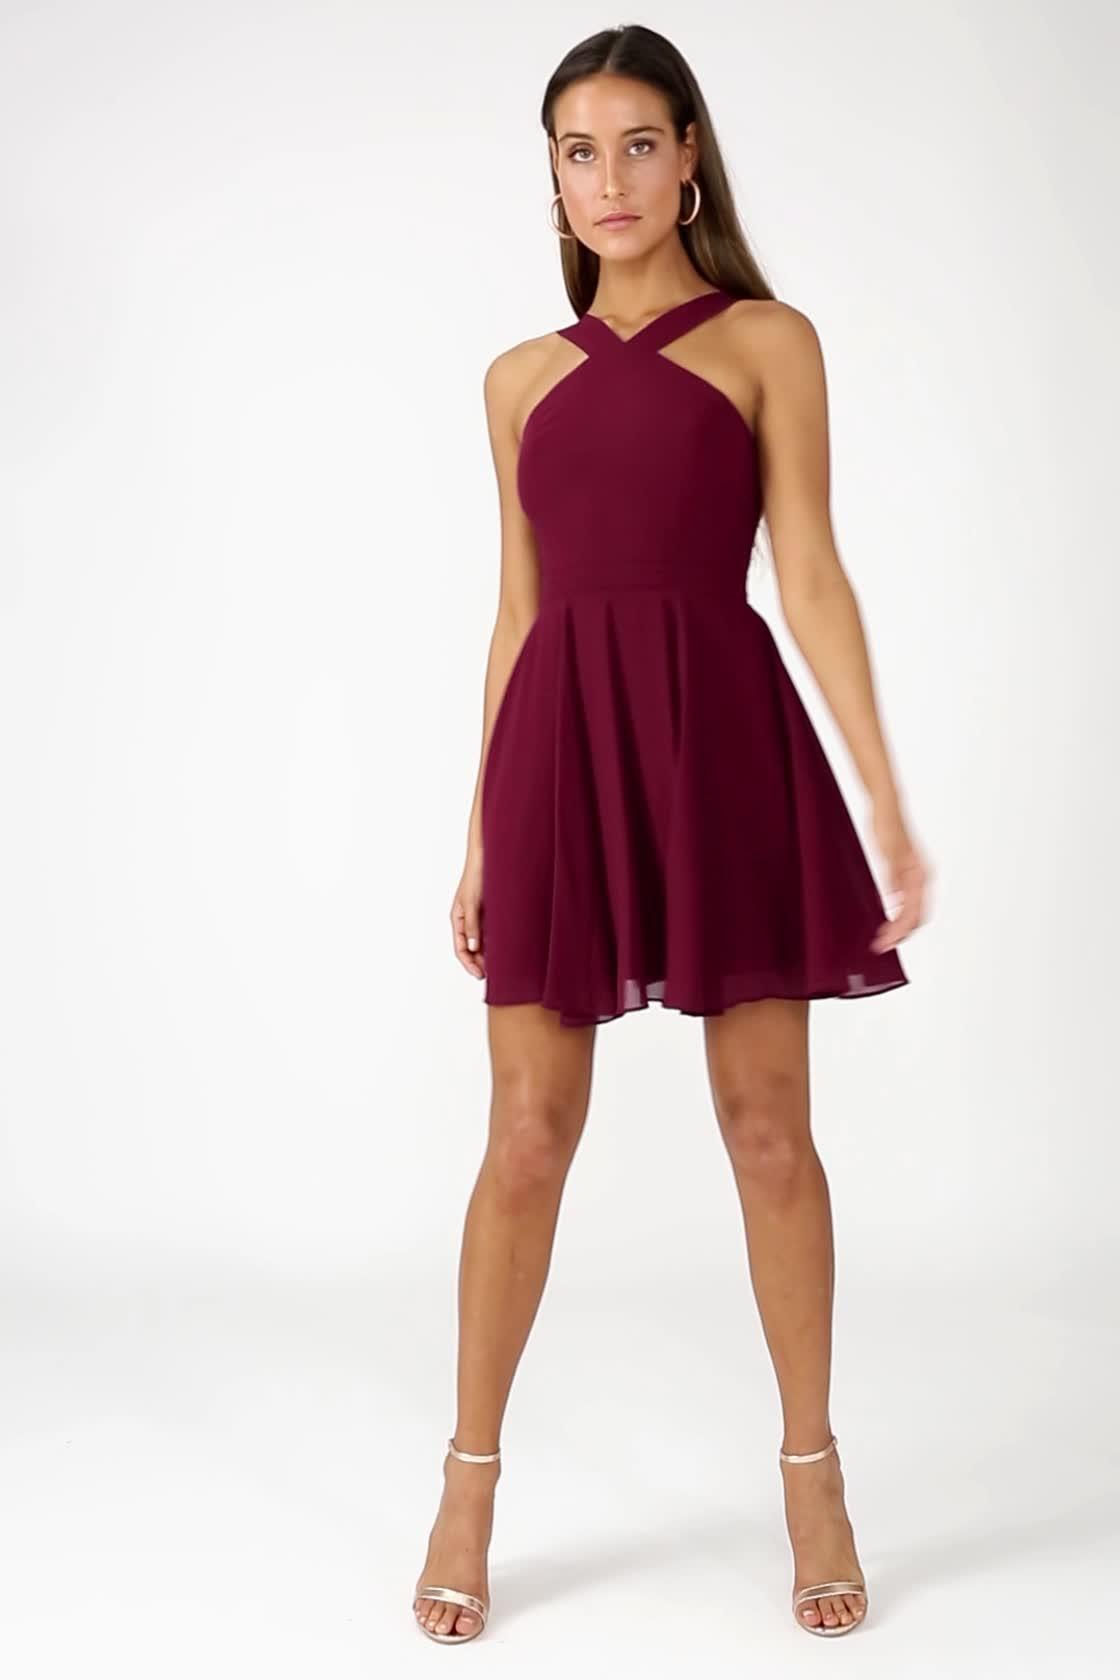 42eb0a24210 Lovely Burgundy Dress - Halter Dress - Bridesmaid Dress